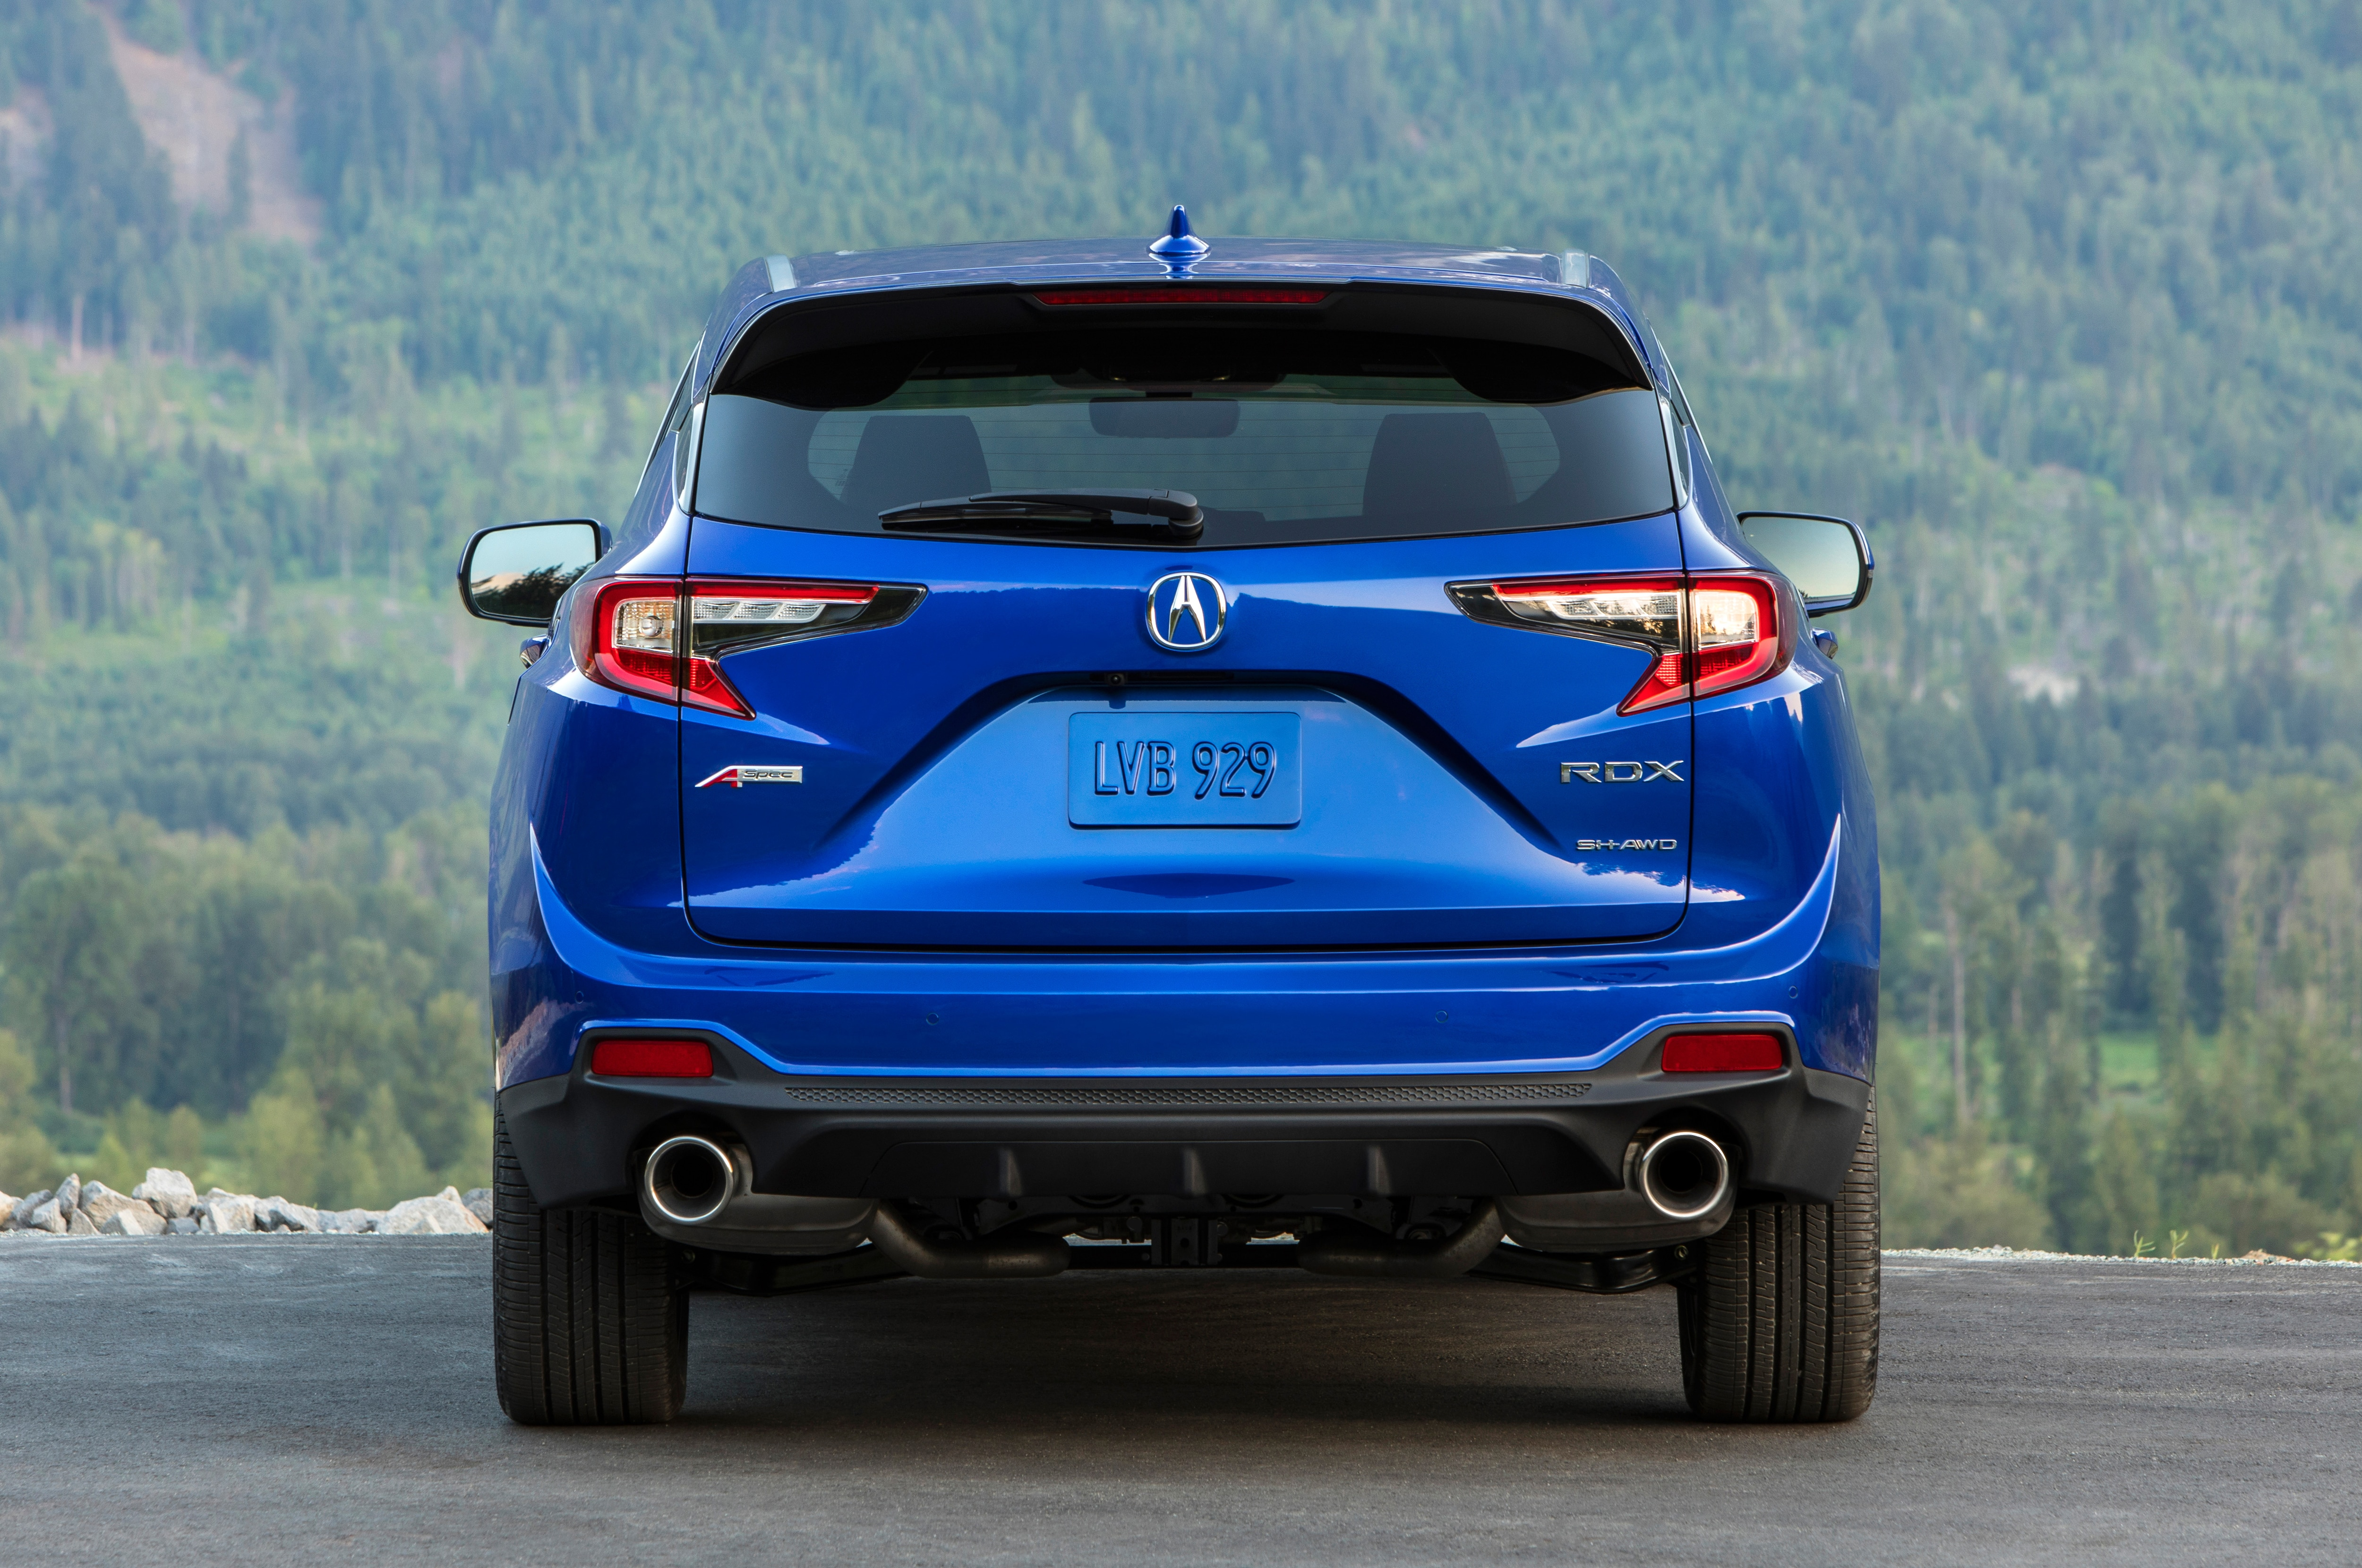 2019 Acura RDX: Pricing Starts at $37,300